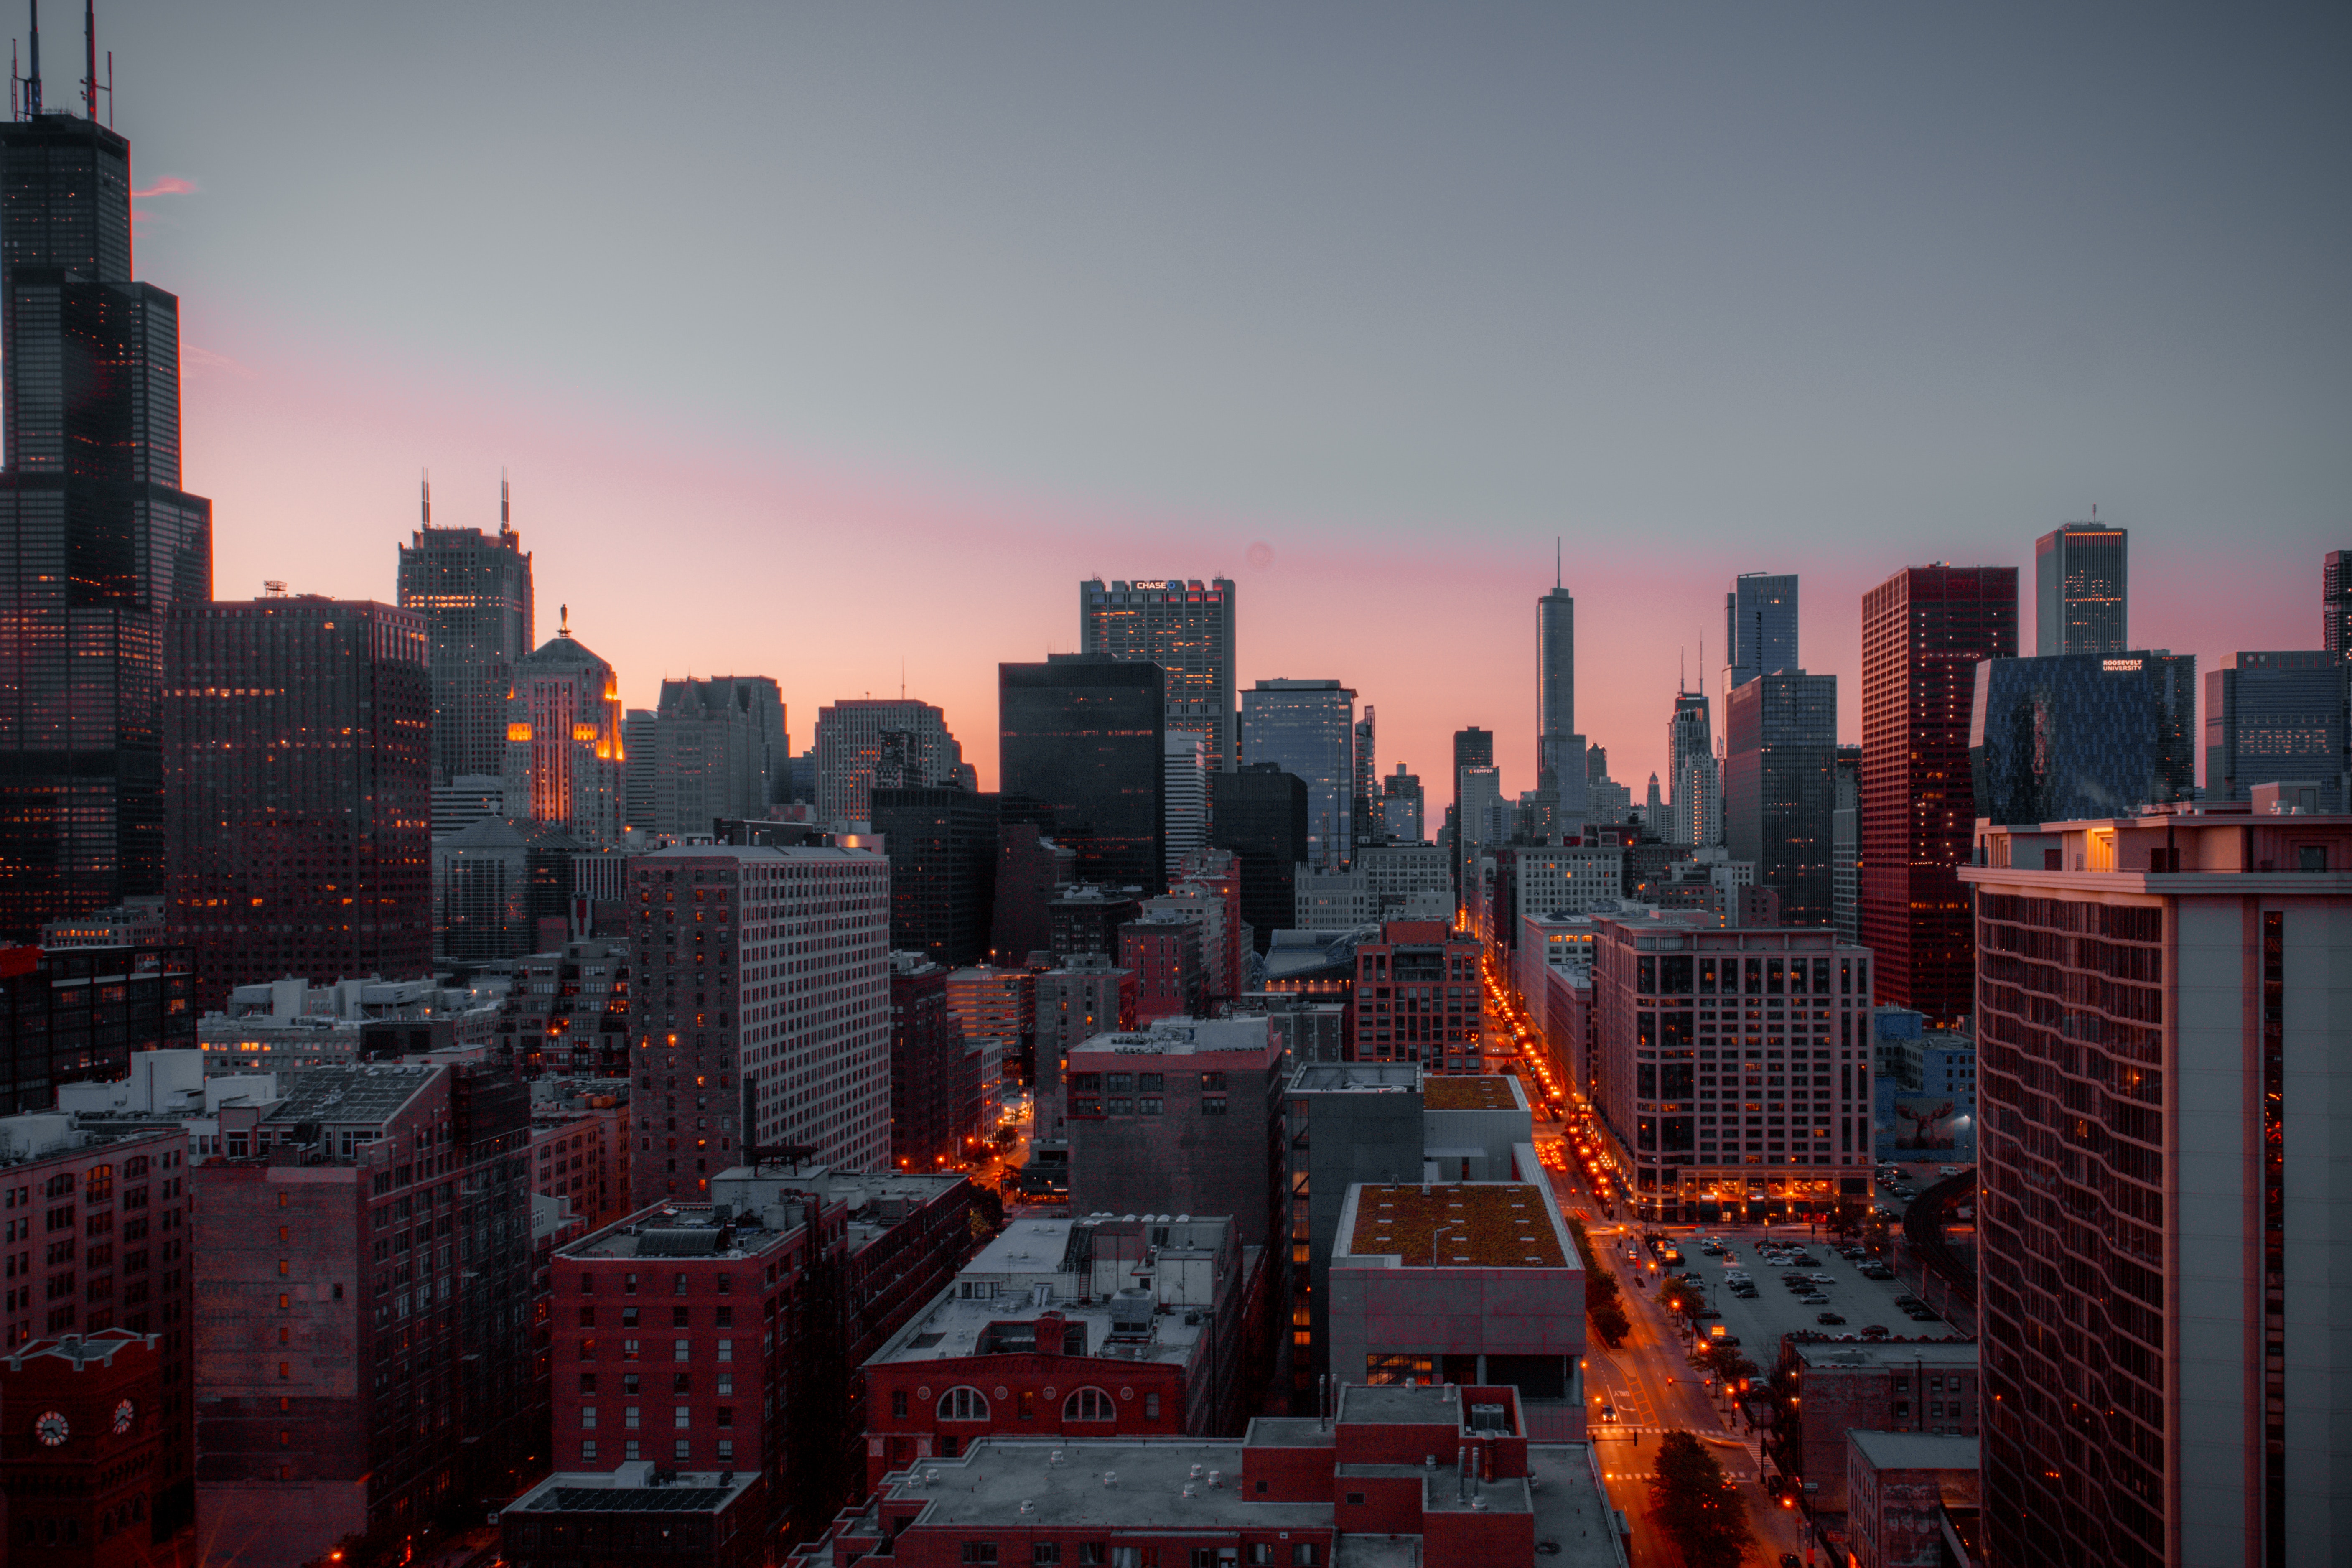 City skyline overlooking rooftops during orange sunset